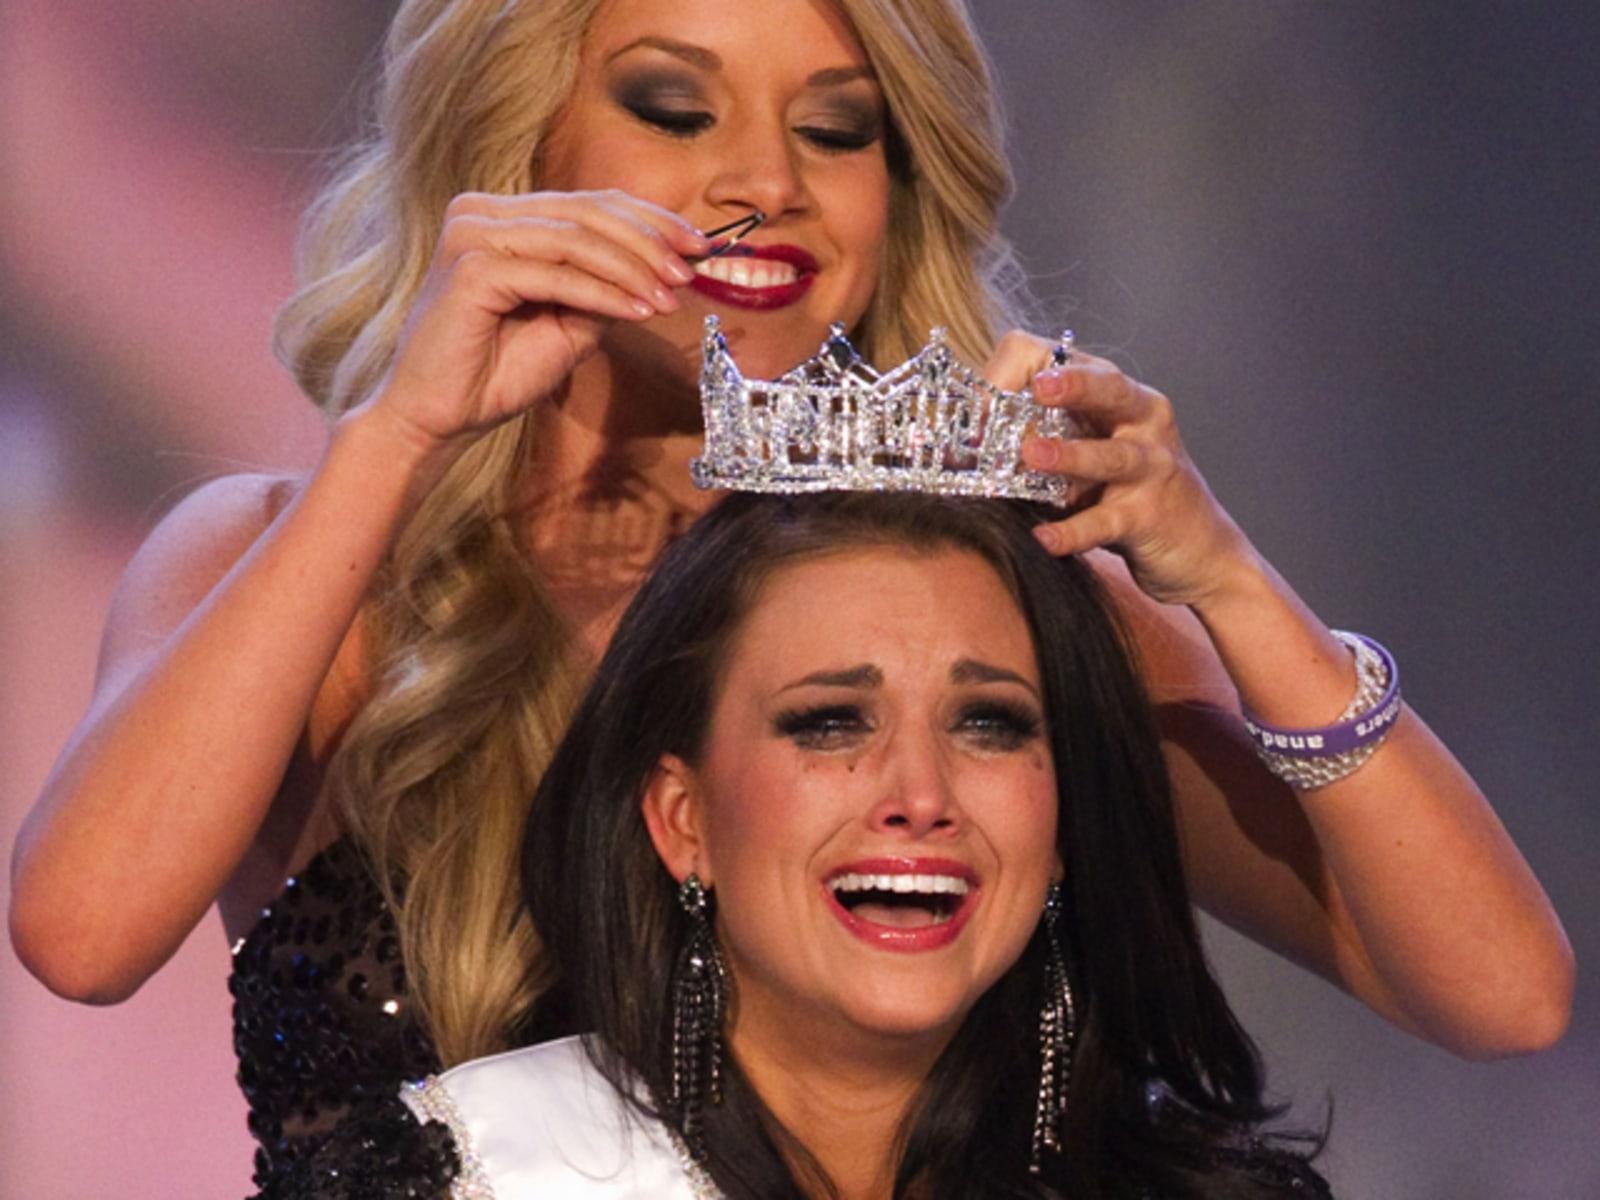 Image: Laura Kaeppeler being crowned